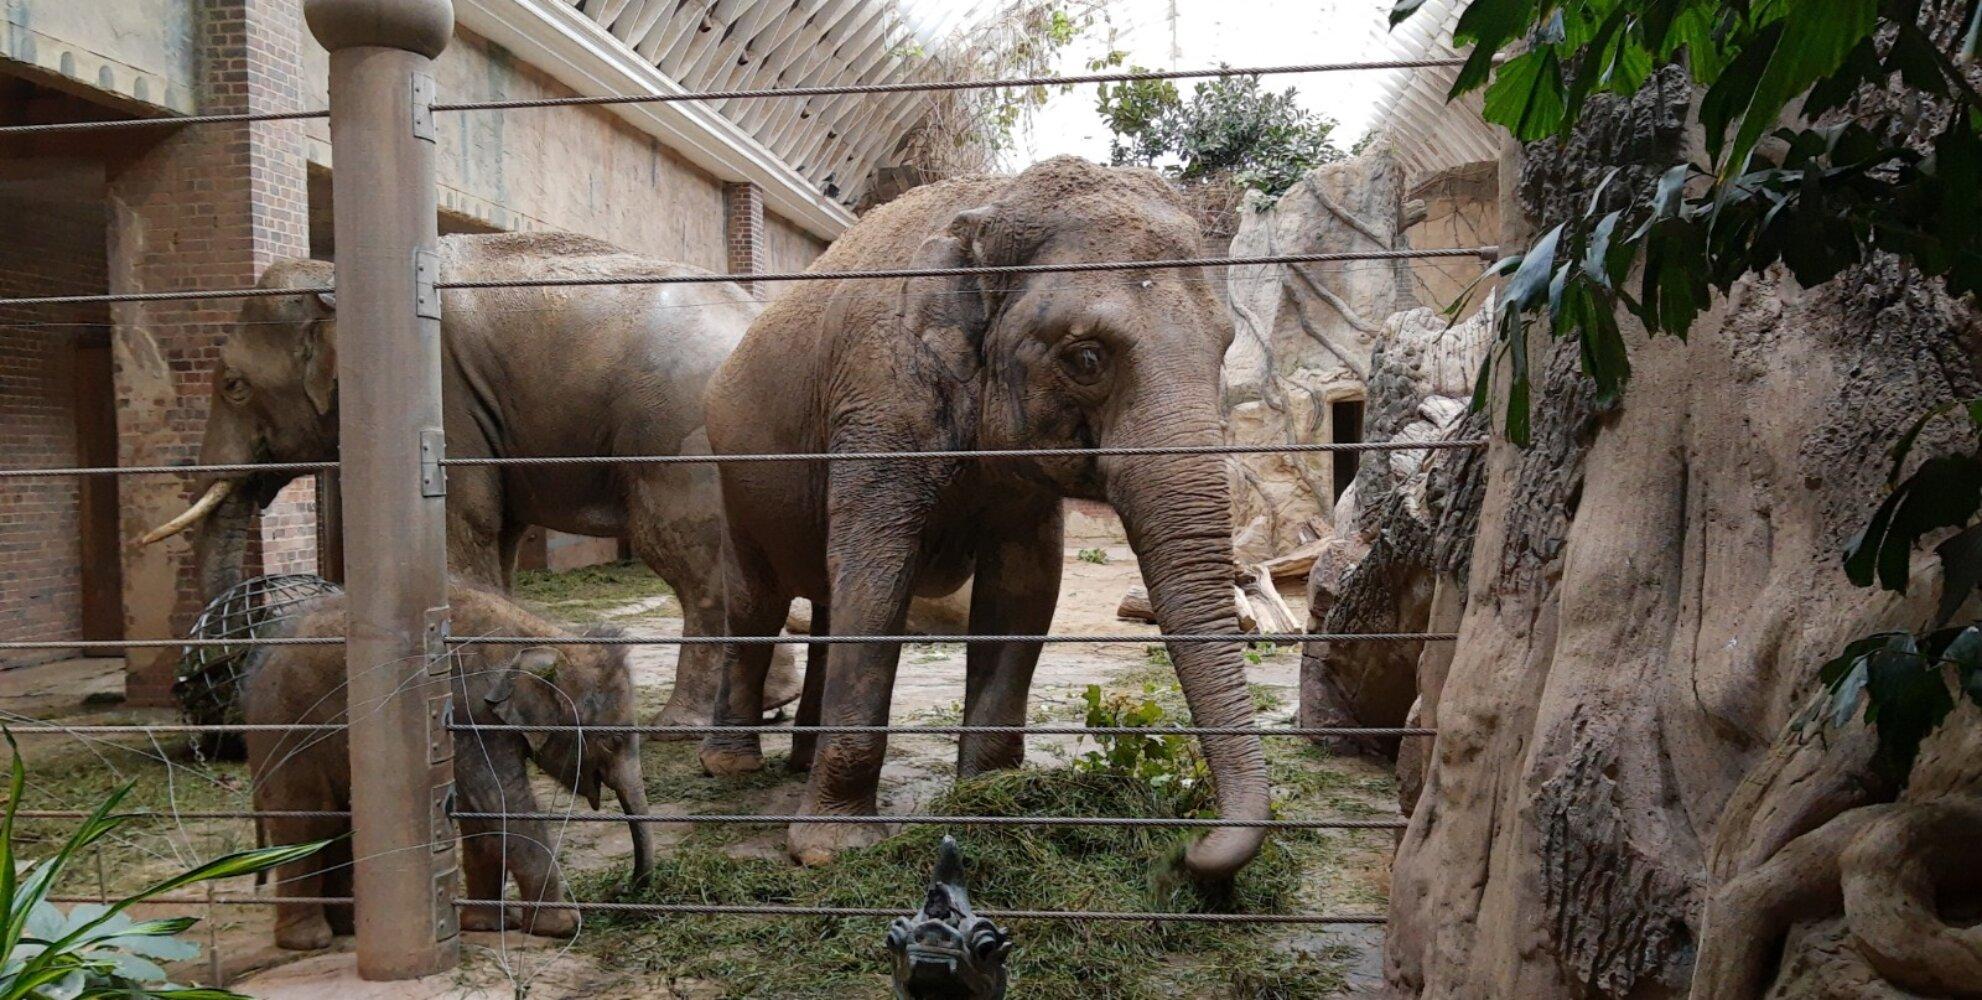 Indischer Elefant im Leipziger Zoo © SK